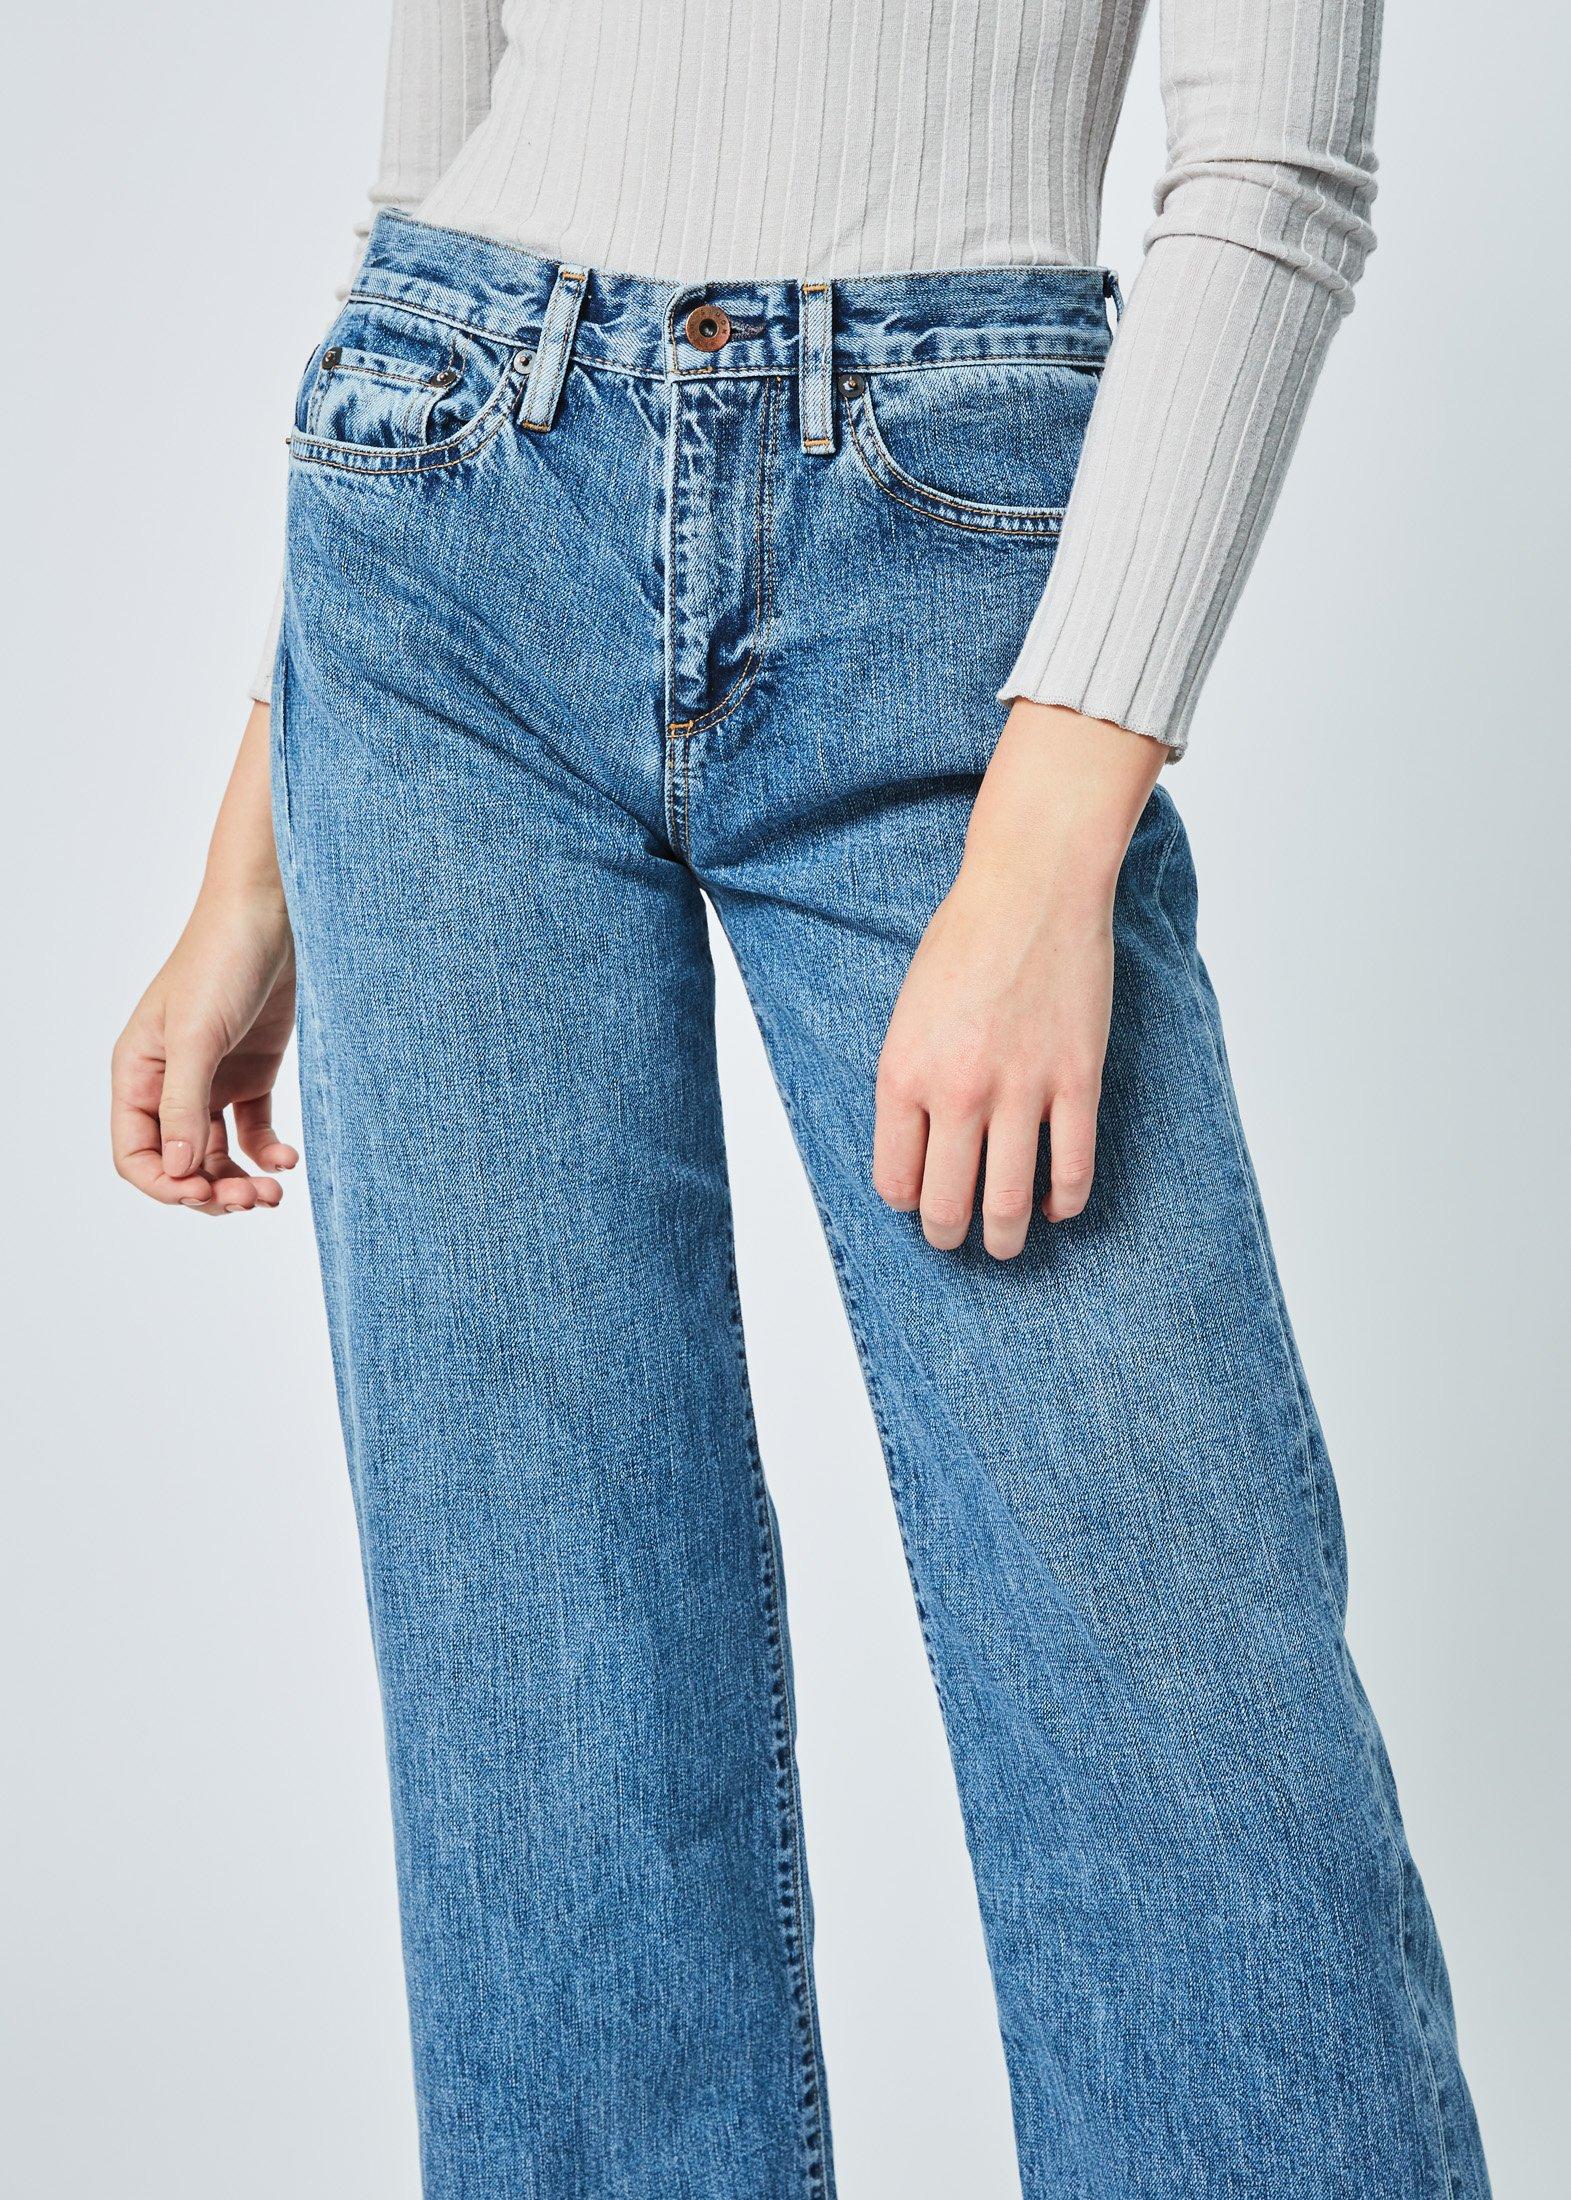 0bc90f75b8f Simon Miller Marlo Wide Leg Jean - Mid Indigo Wash   Garmentory